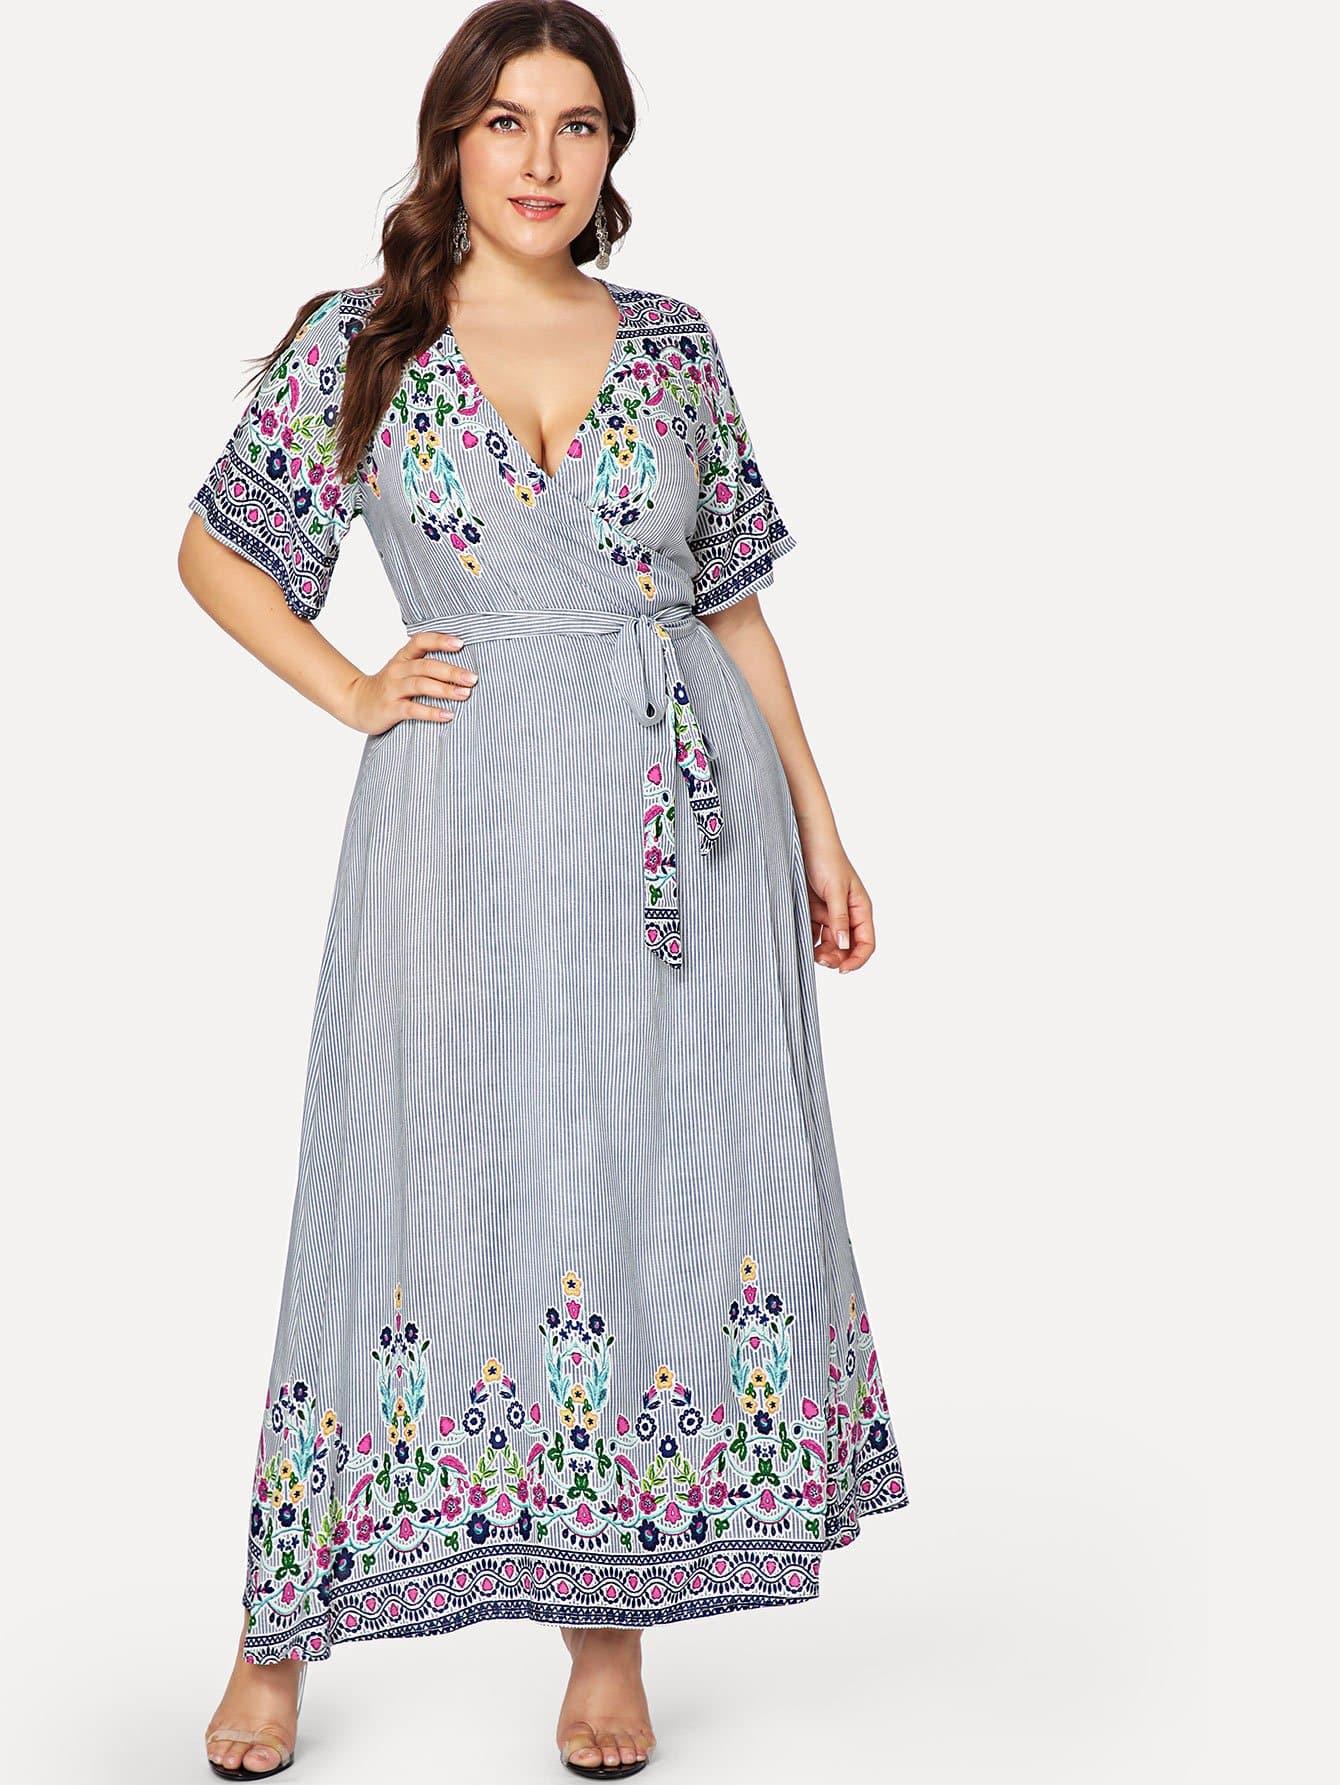 Surplice Neck Mixed Print Dress surplice neck mixed media dress